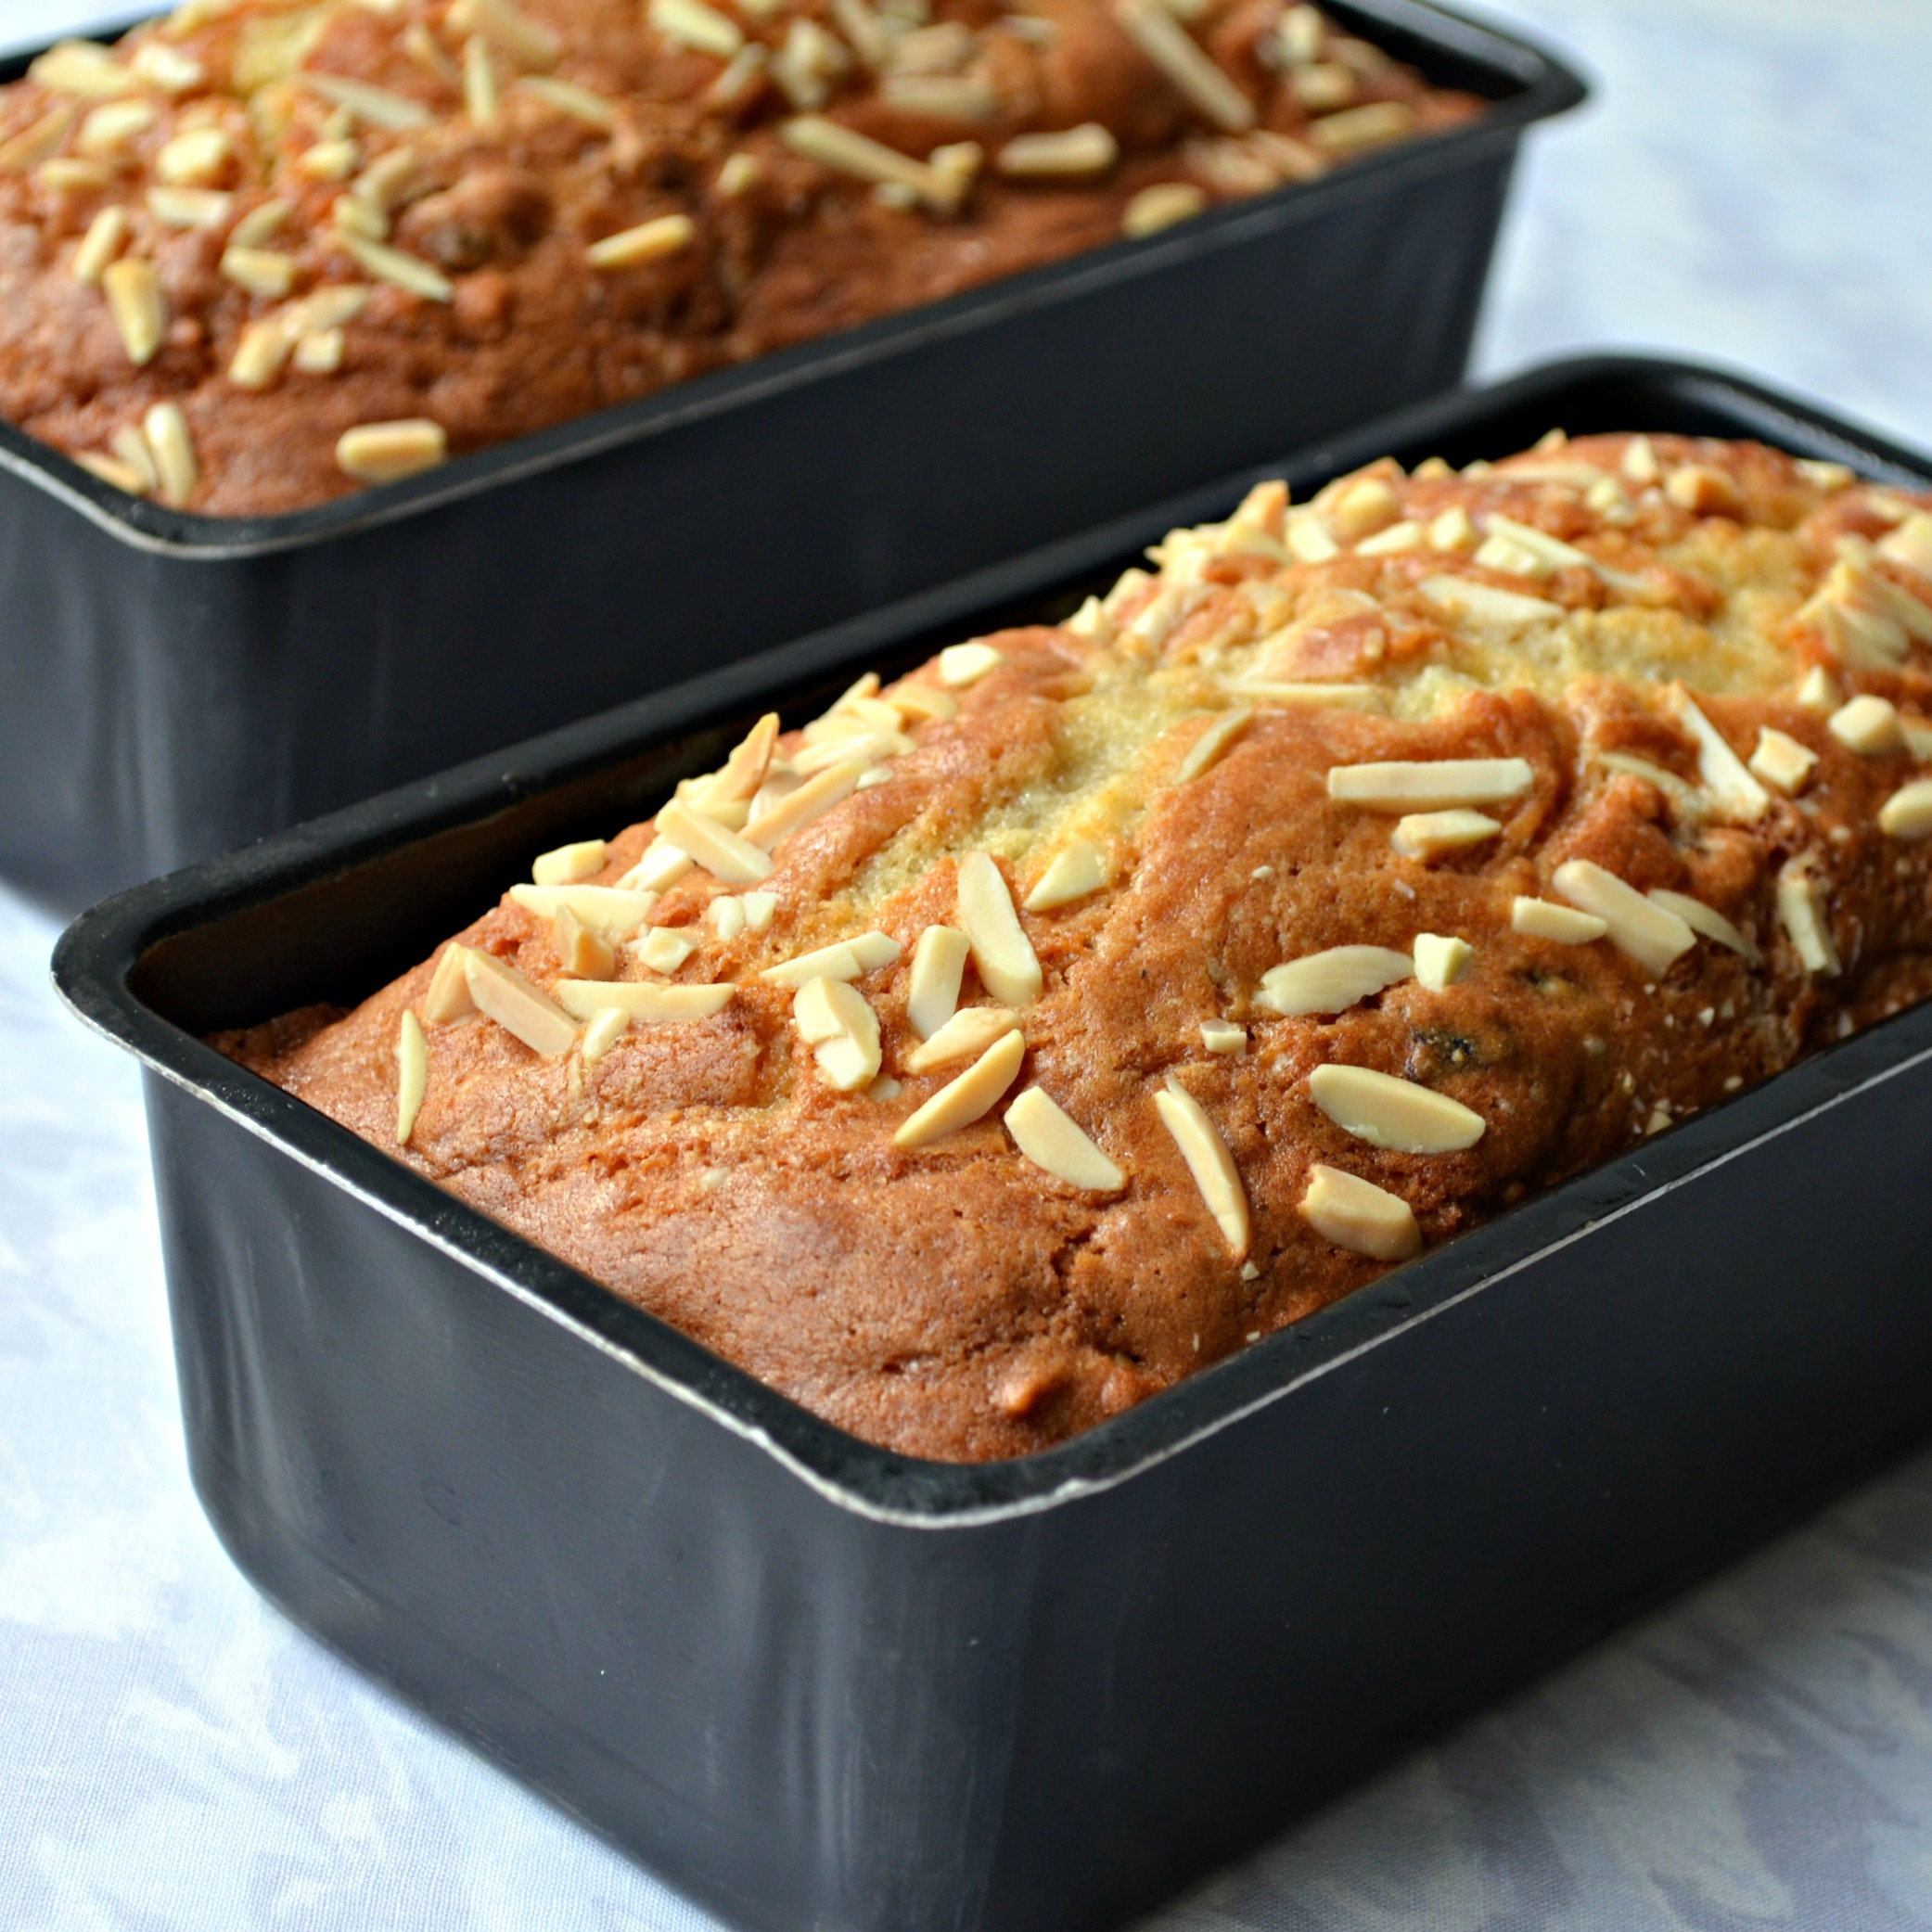 Date, Almond, and Yogurt Bread